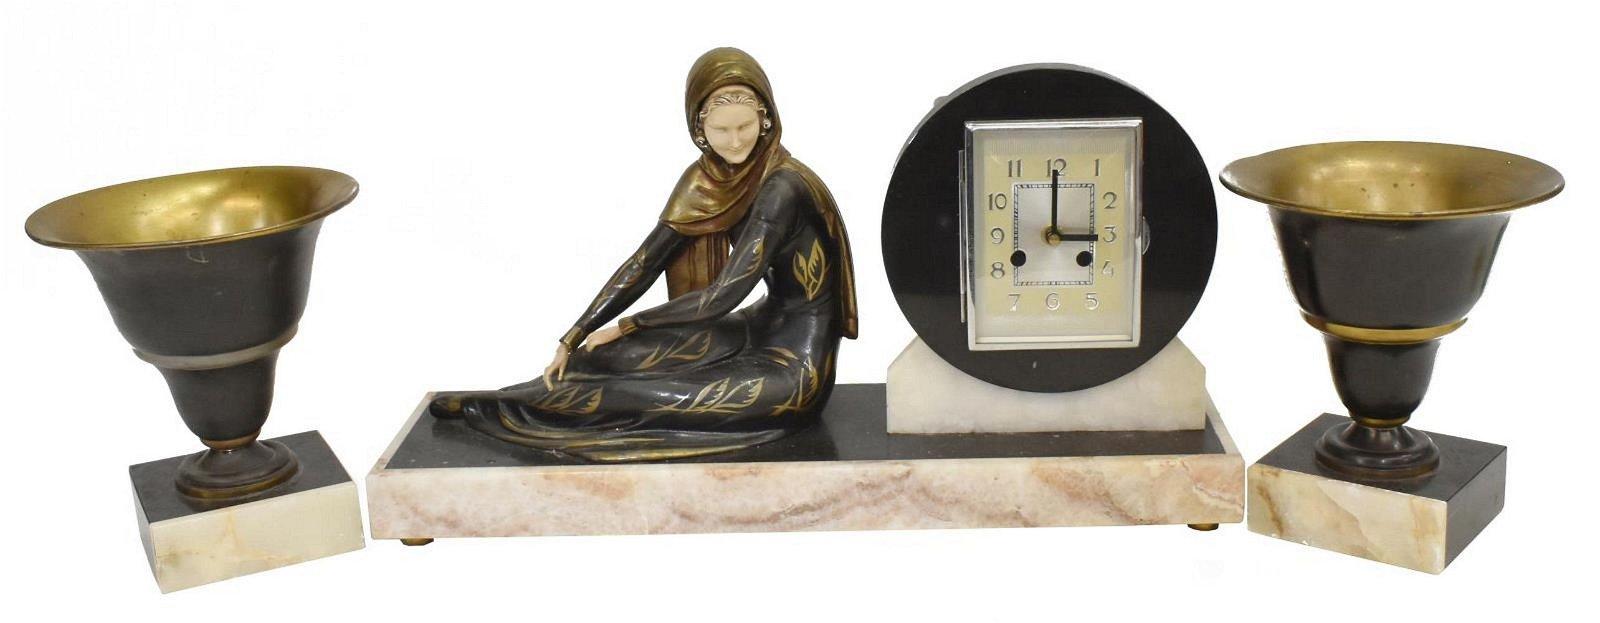 (3) ART DECO FIGURAL MANTEL CLOCK & GARNITURES